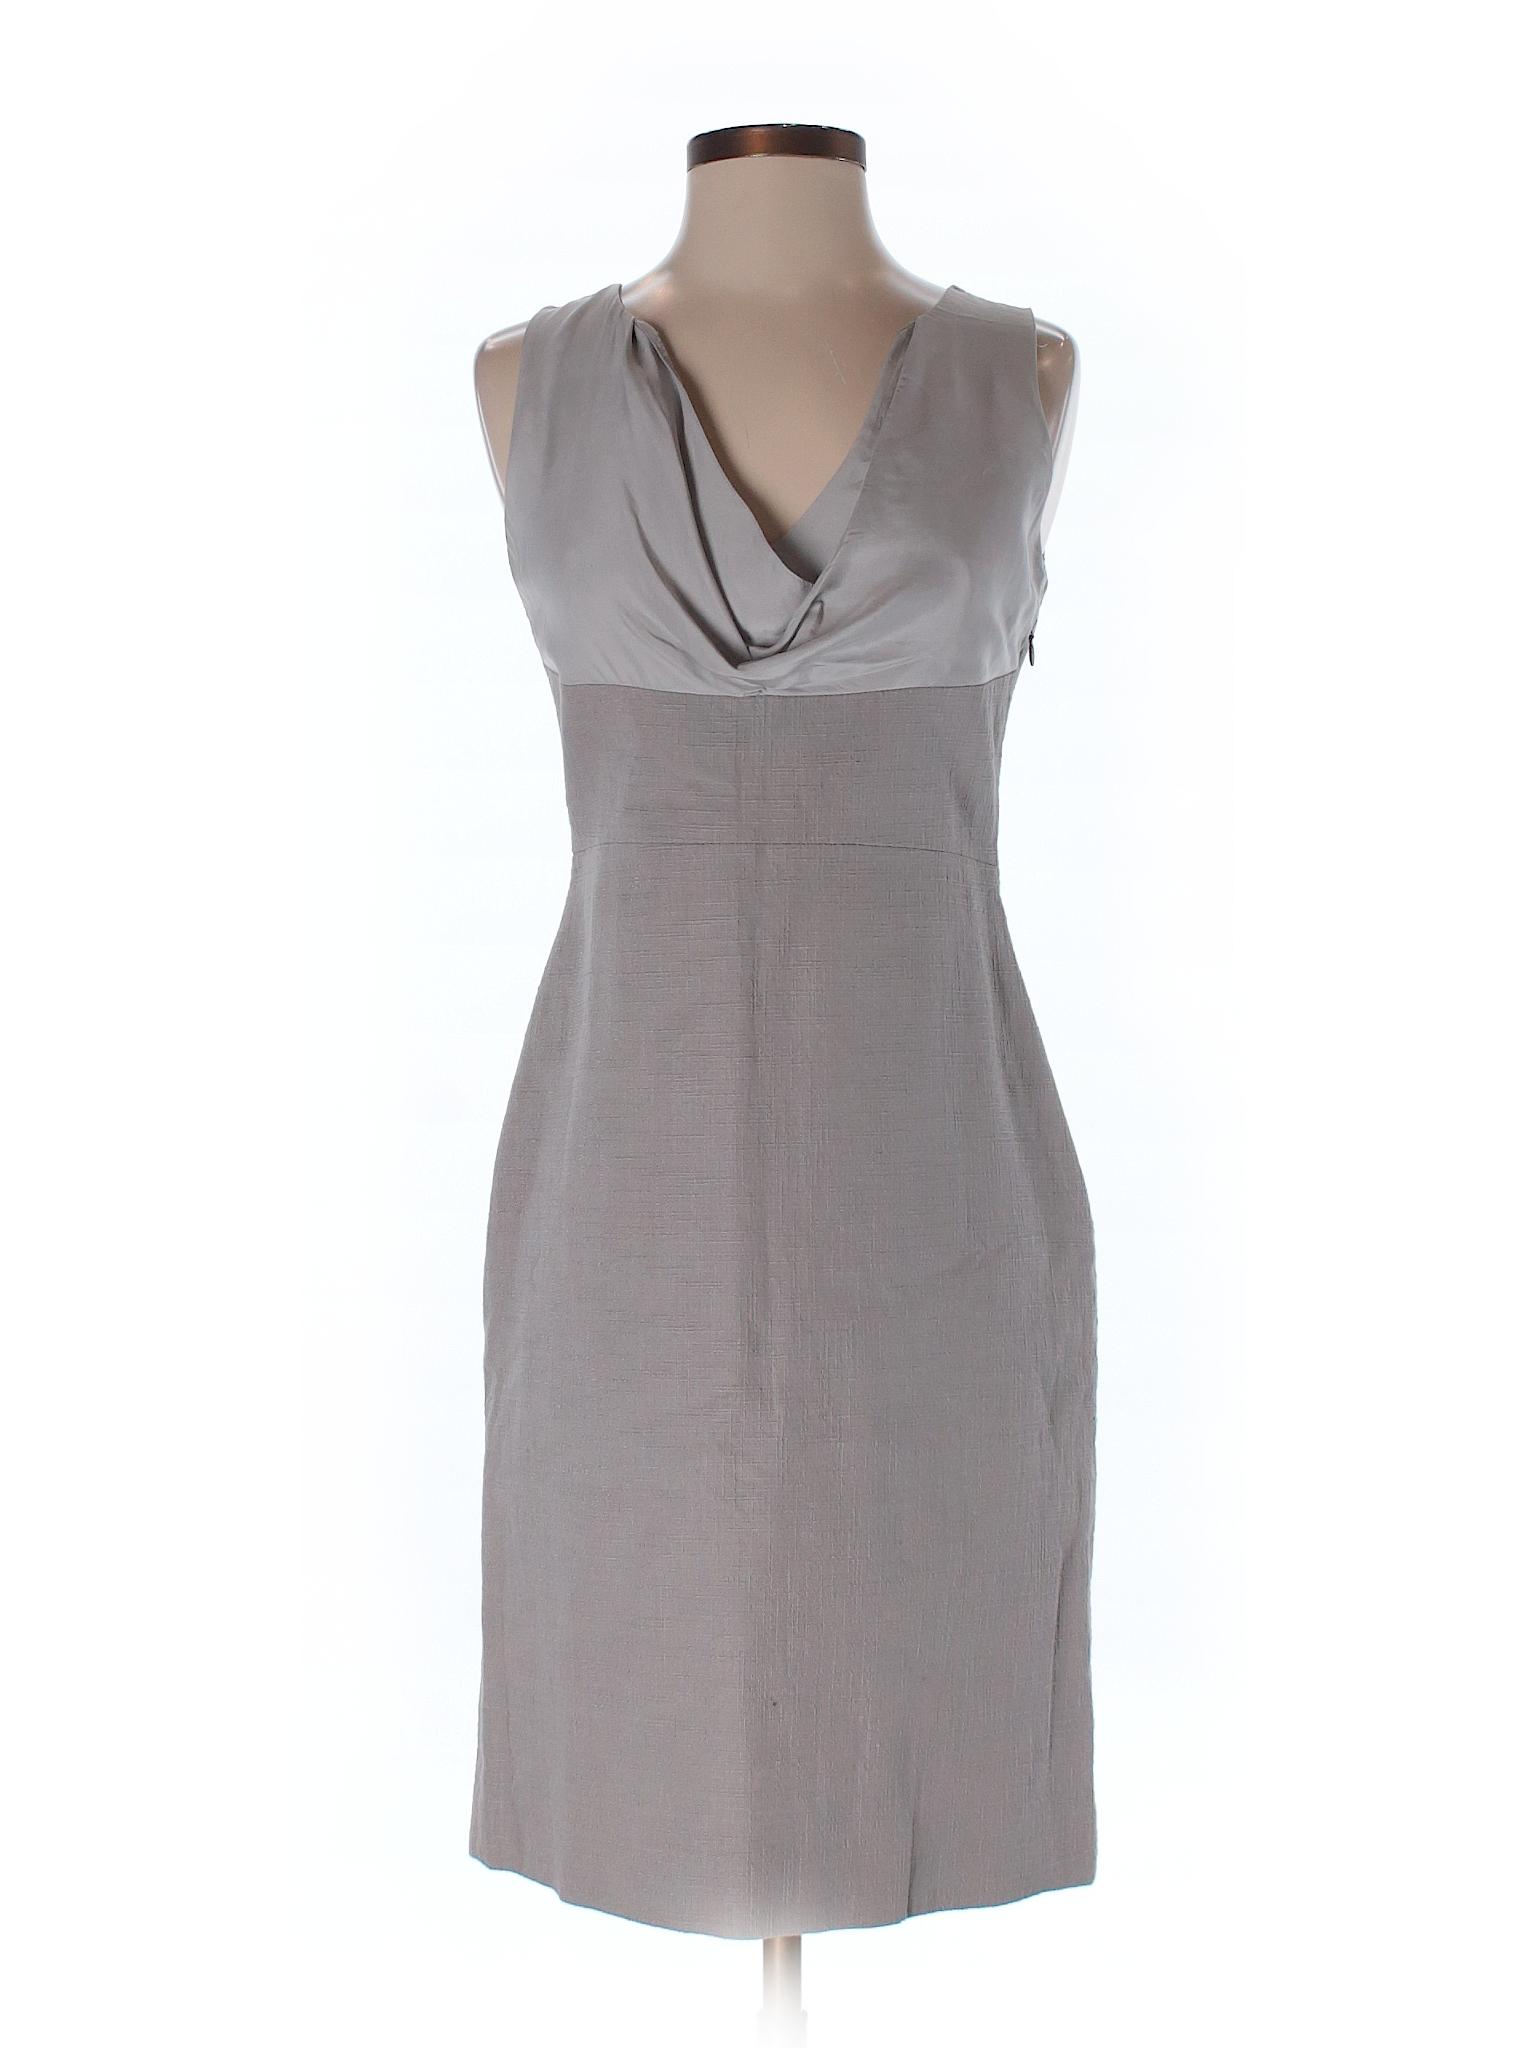 winter Casual J Dress Crew Boutique 1dt7vq5w1x